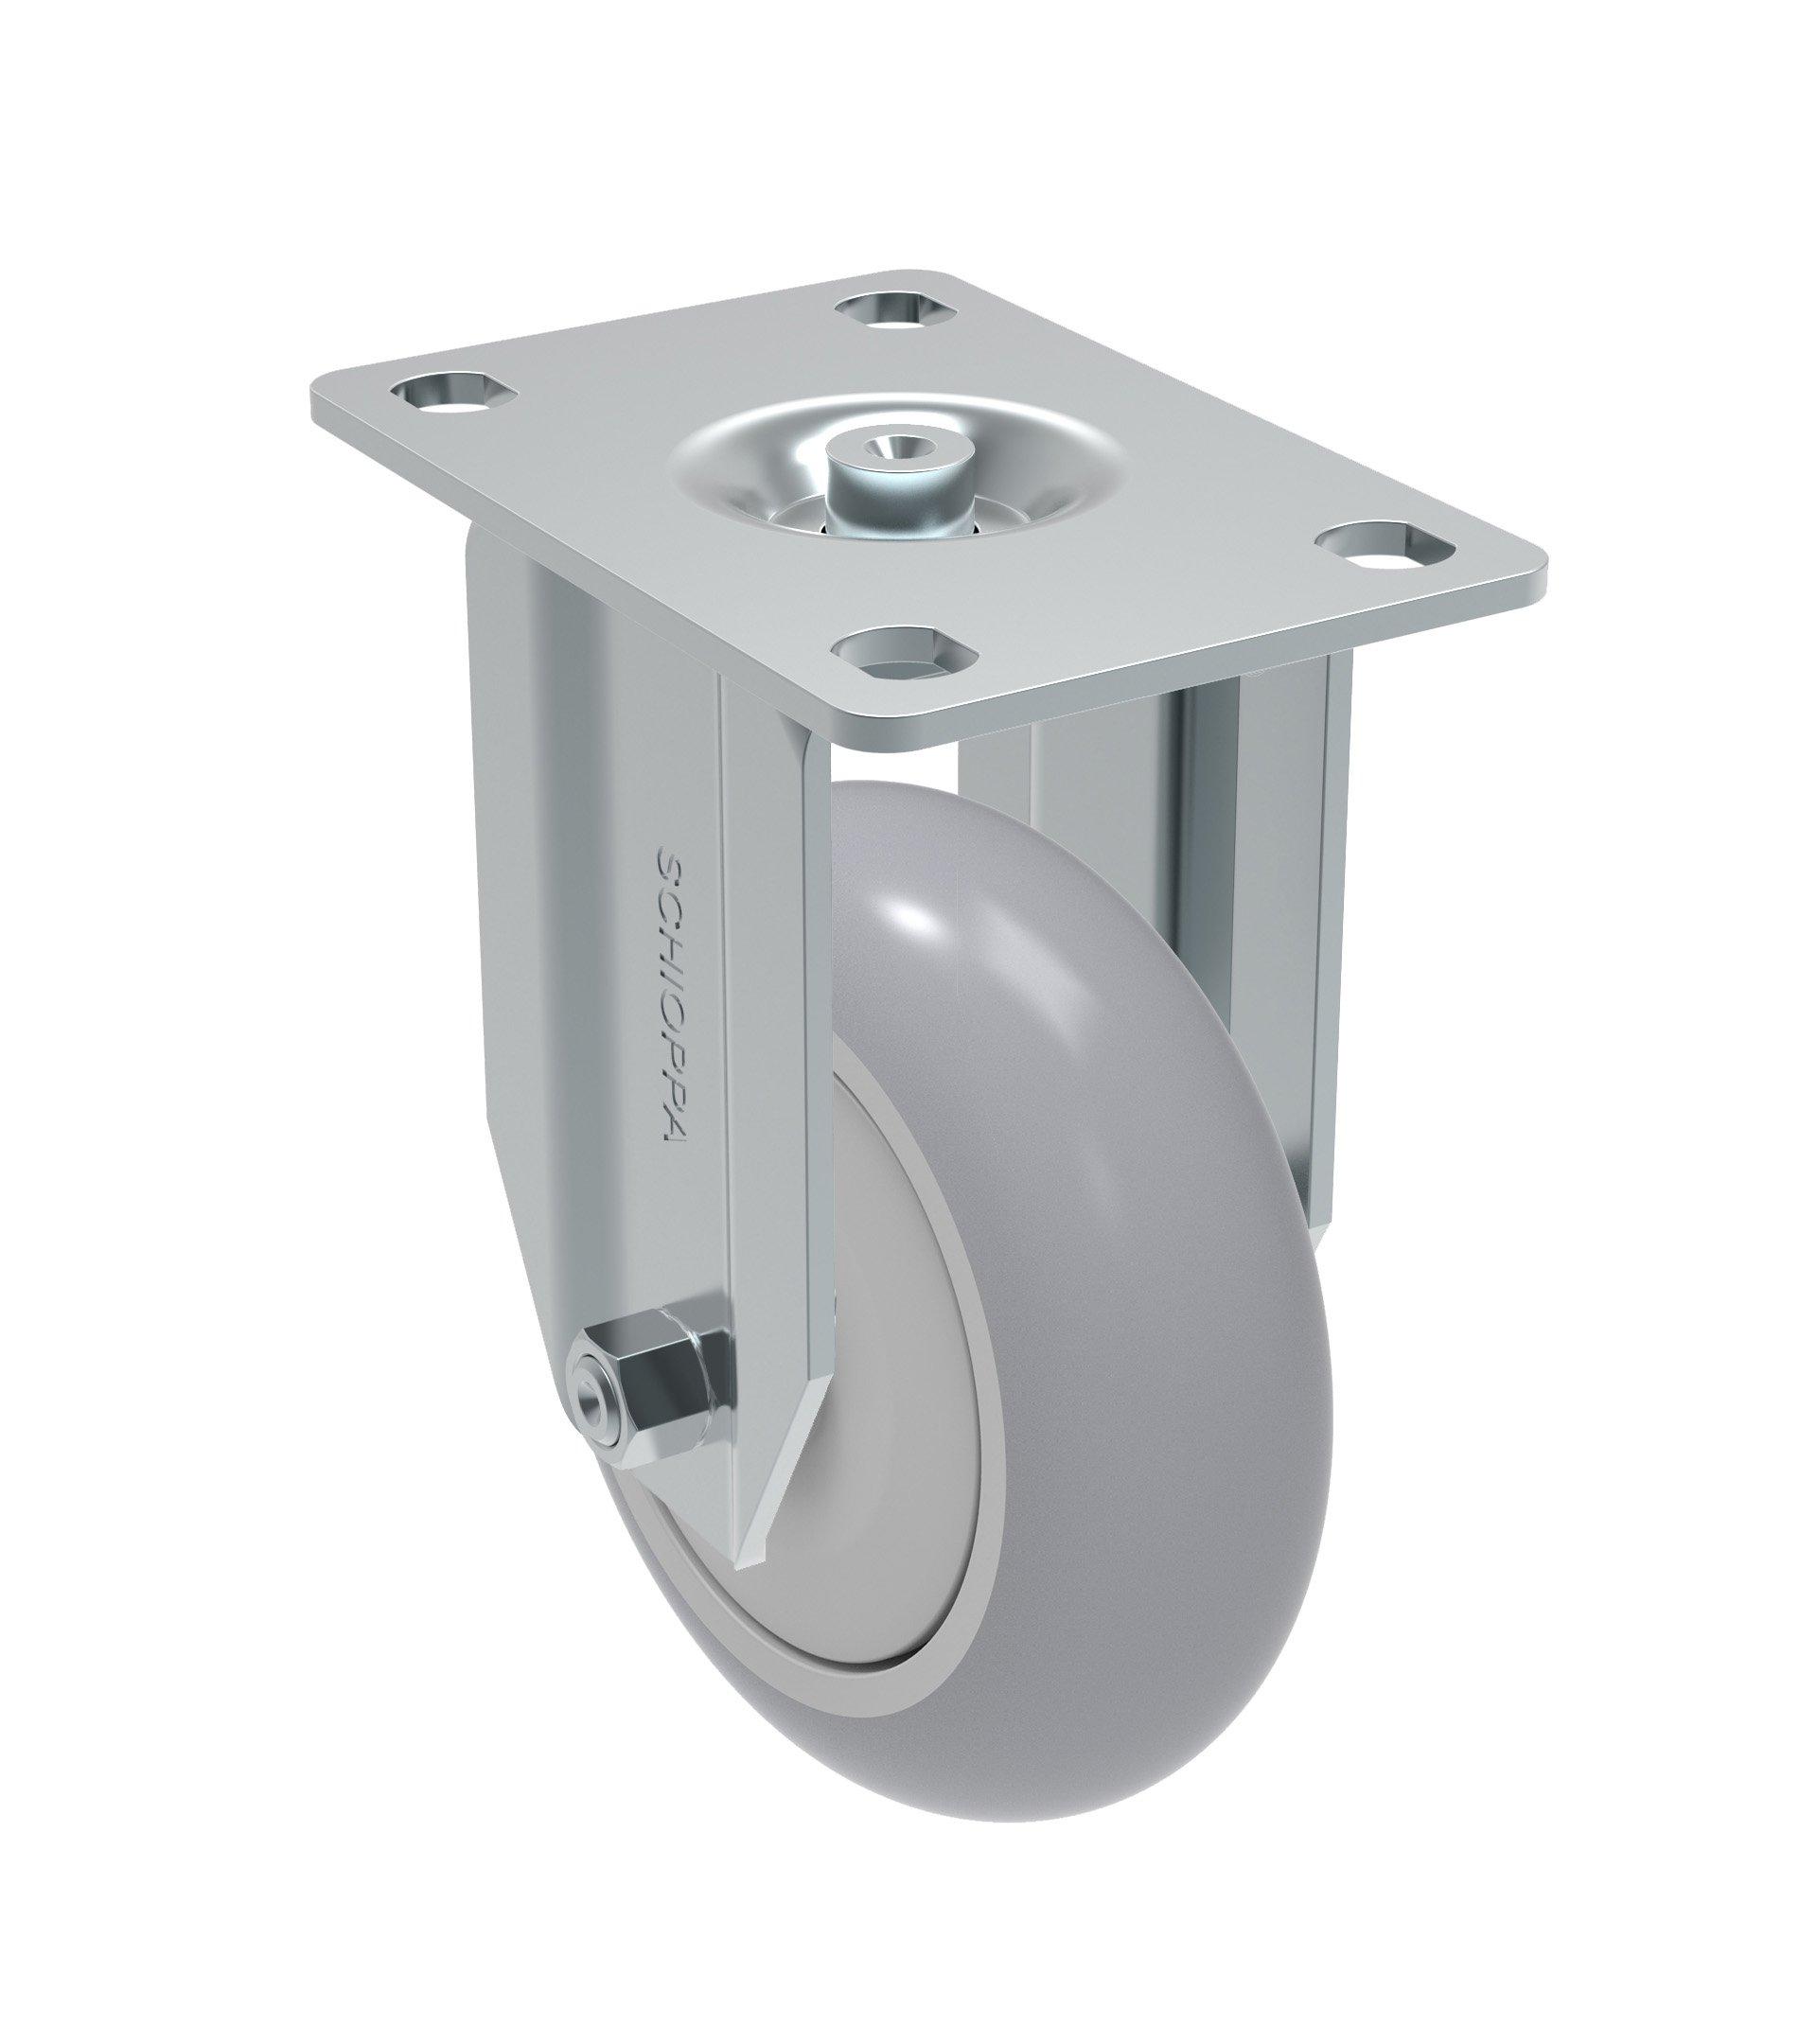 Schioppa FLA 412 SPE - Flat Tread L12 Series 4'' x 1-1/4'' Diameter Rigid Caster, Non-Marking Extra Soft Thermoplastic Rubber Precision Ball Bearing Wheel, Plate 3-3/4'' x 2-1/2'' (Bolt Holes 3'' x 1-3/4''), 185 lb by Schioppa (Image #1)